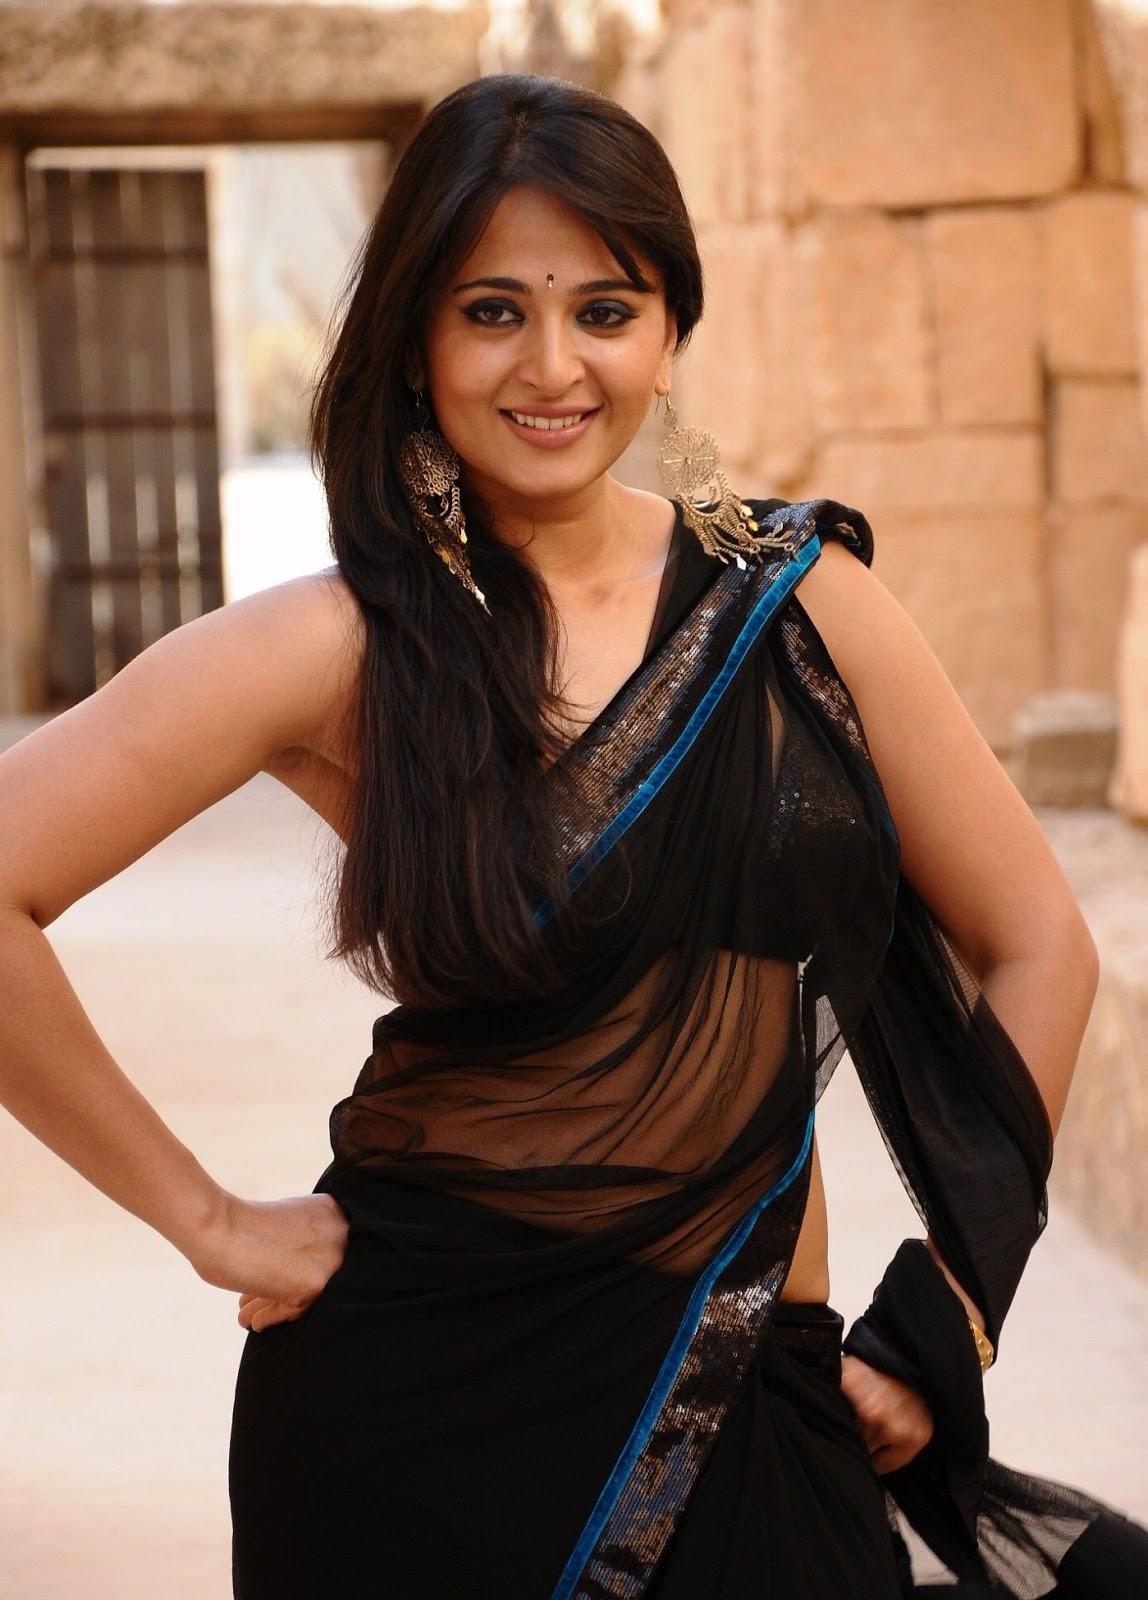 Star Fashion Galleries: Anushka Shetty is the hottest